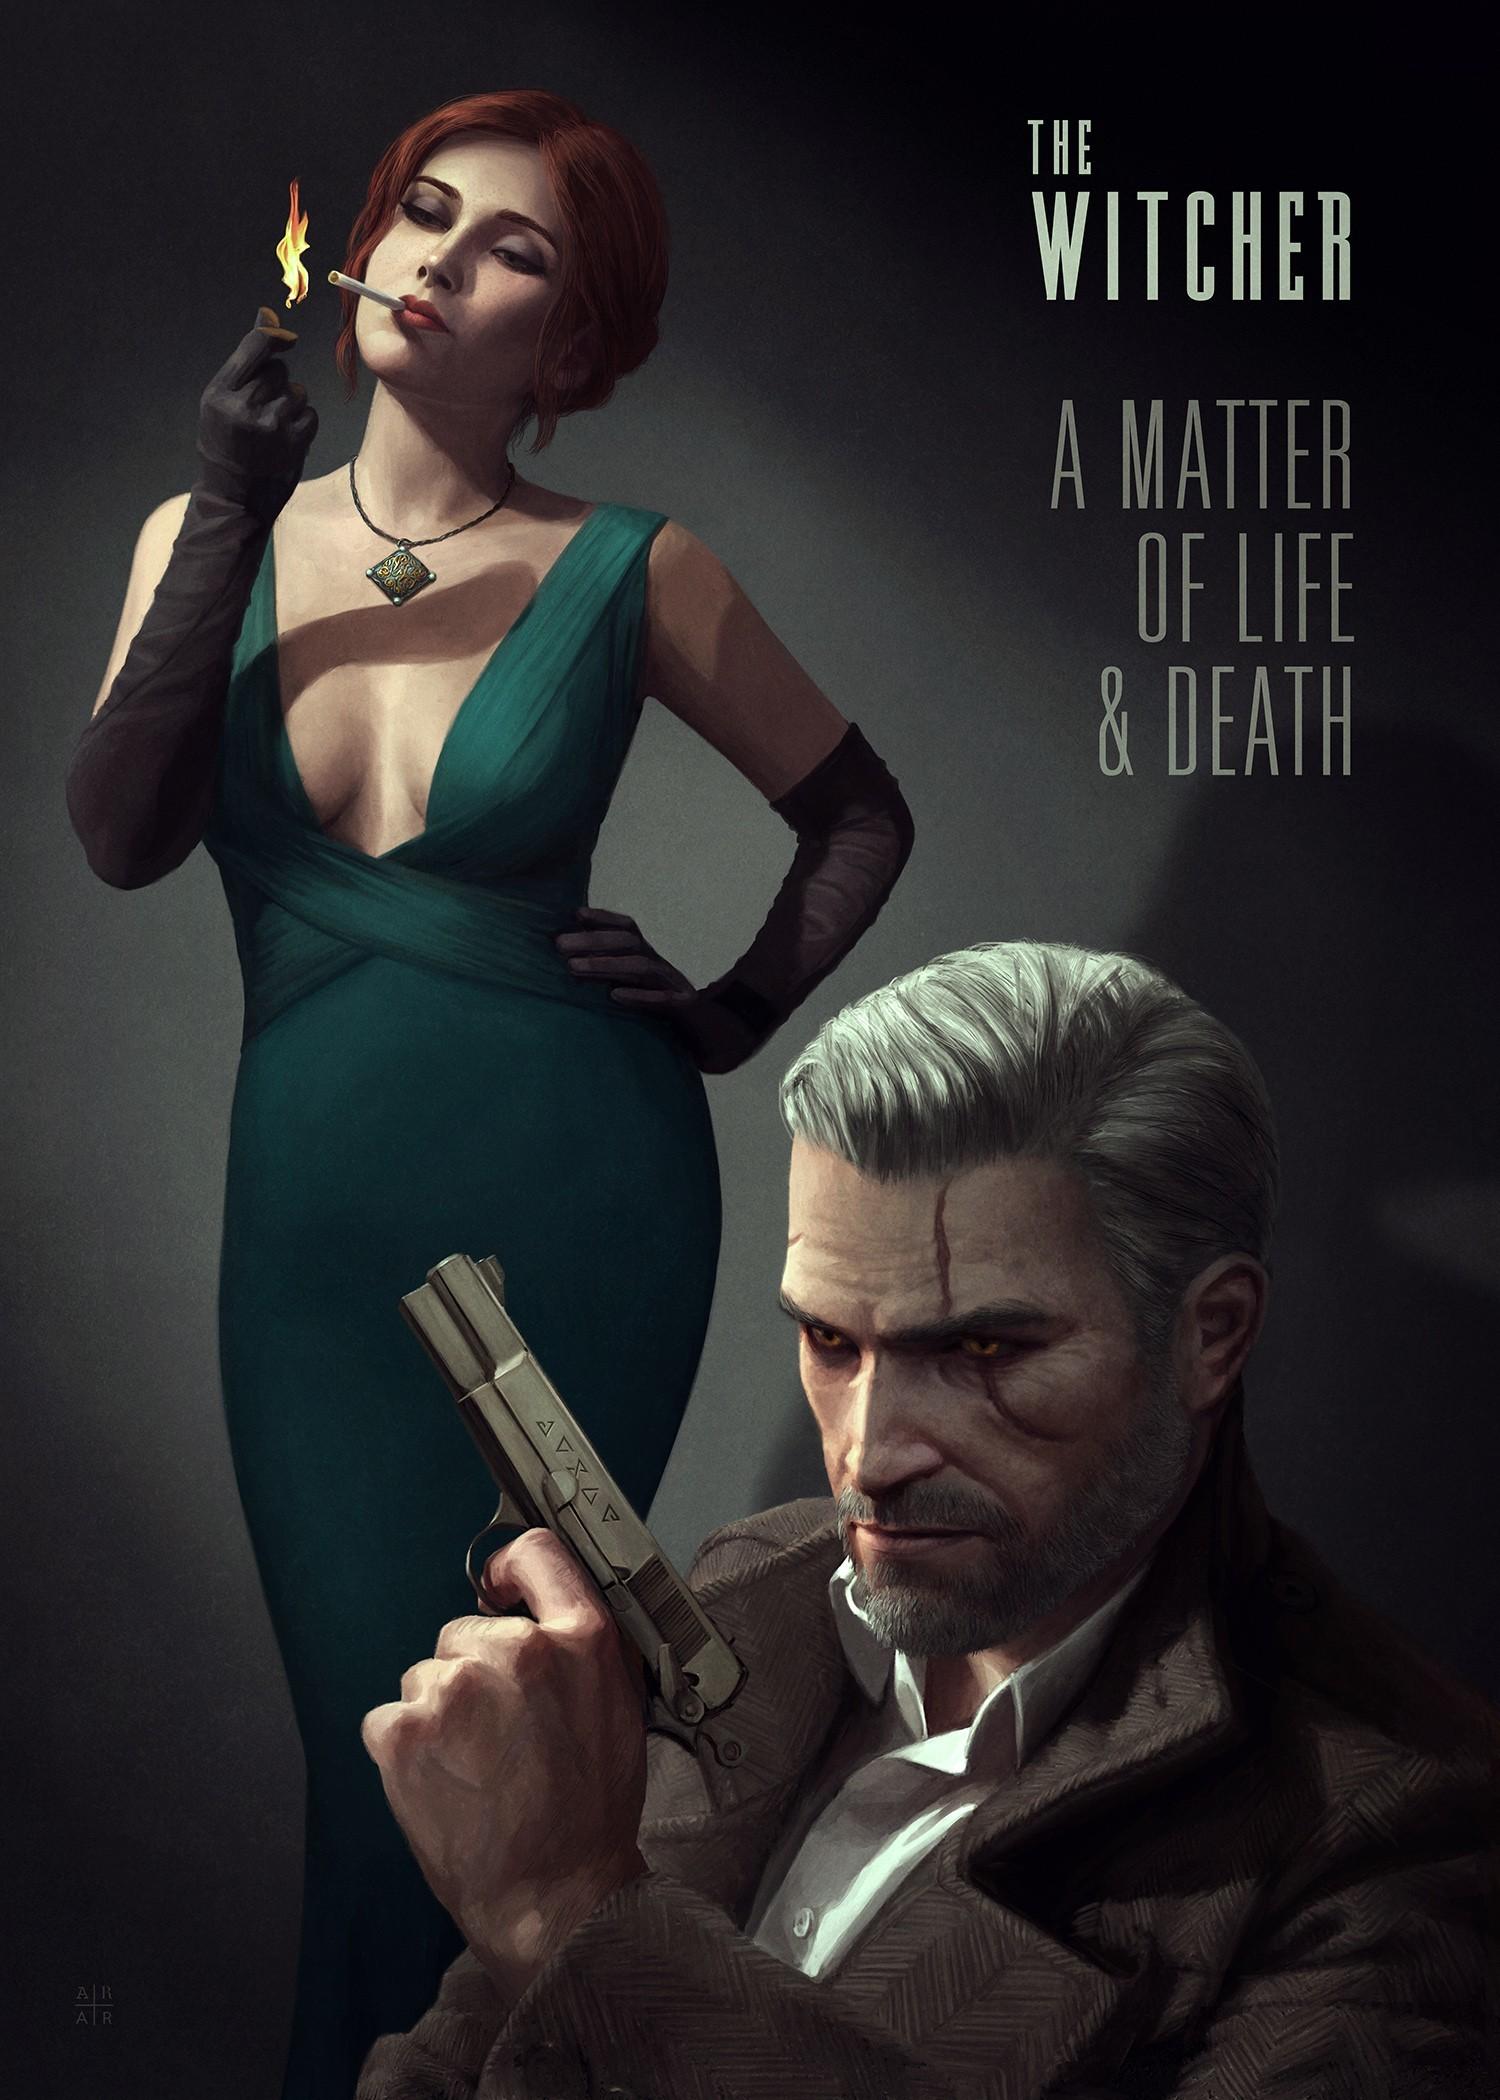 Geralt of Rivia, Triss Merigold, The Witcher, The Witcher 3: Wild Hunt,  Artwork, Digital art, Poster, Noir Wallpapers HD / Desktop and Mobile  Backgrounds